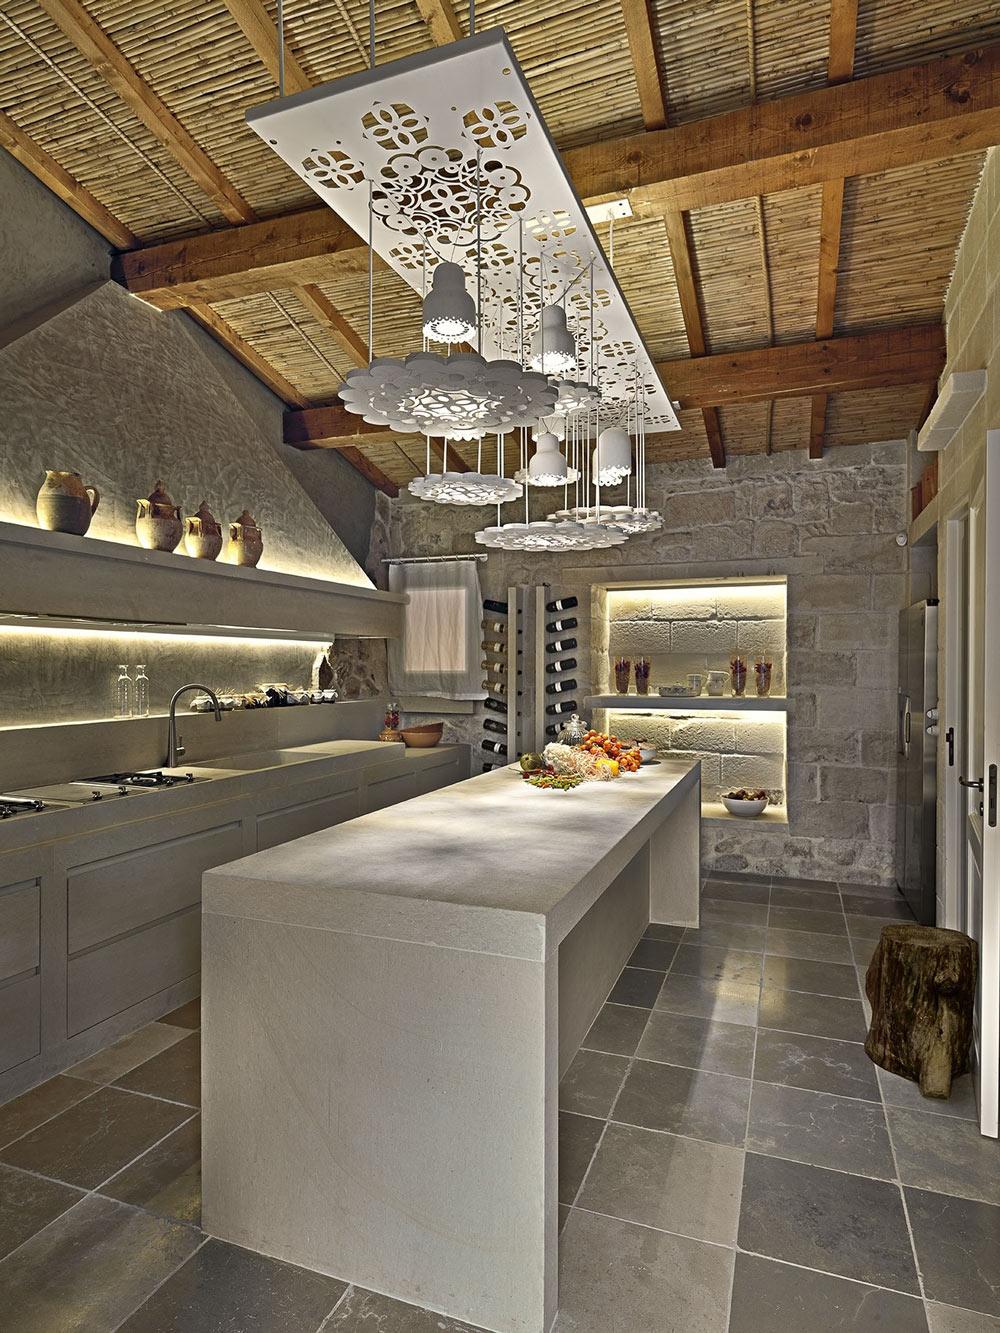 Kitchen Island, Lighting, Relais Masseria Capasa Hotel in Martano, Italy